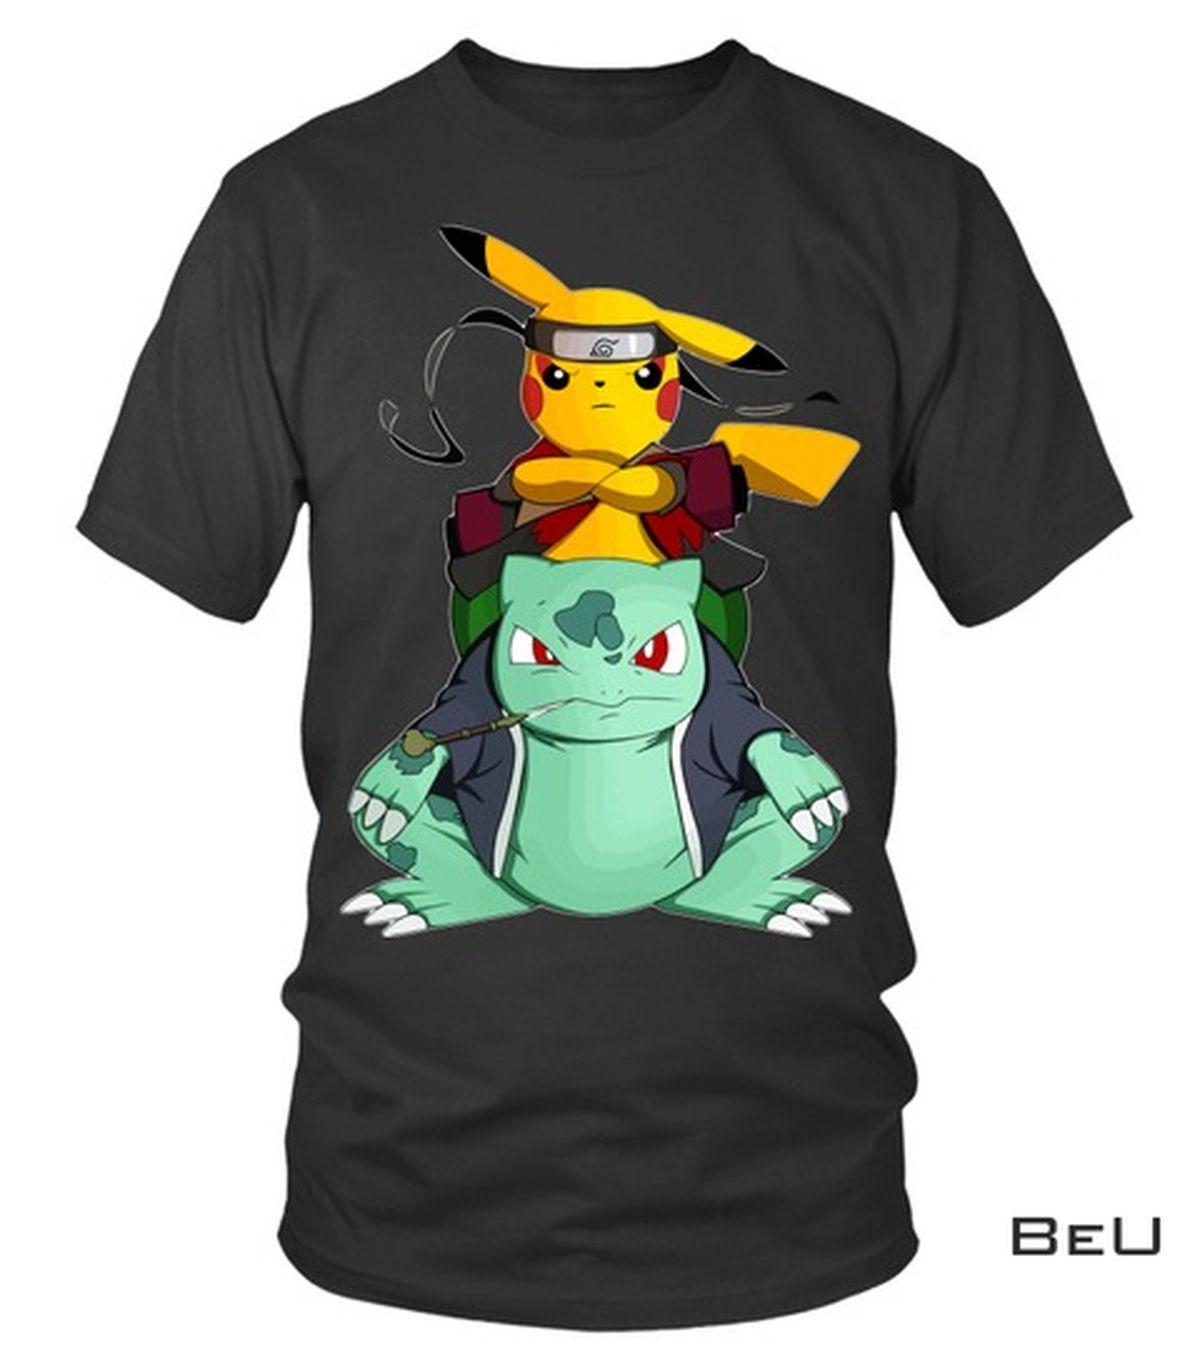 Discount Pokemon Pikachu Sasuke Shirt, hoodie, tank top